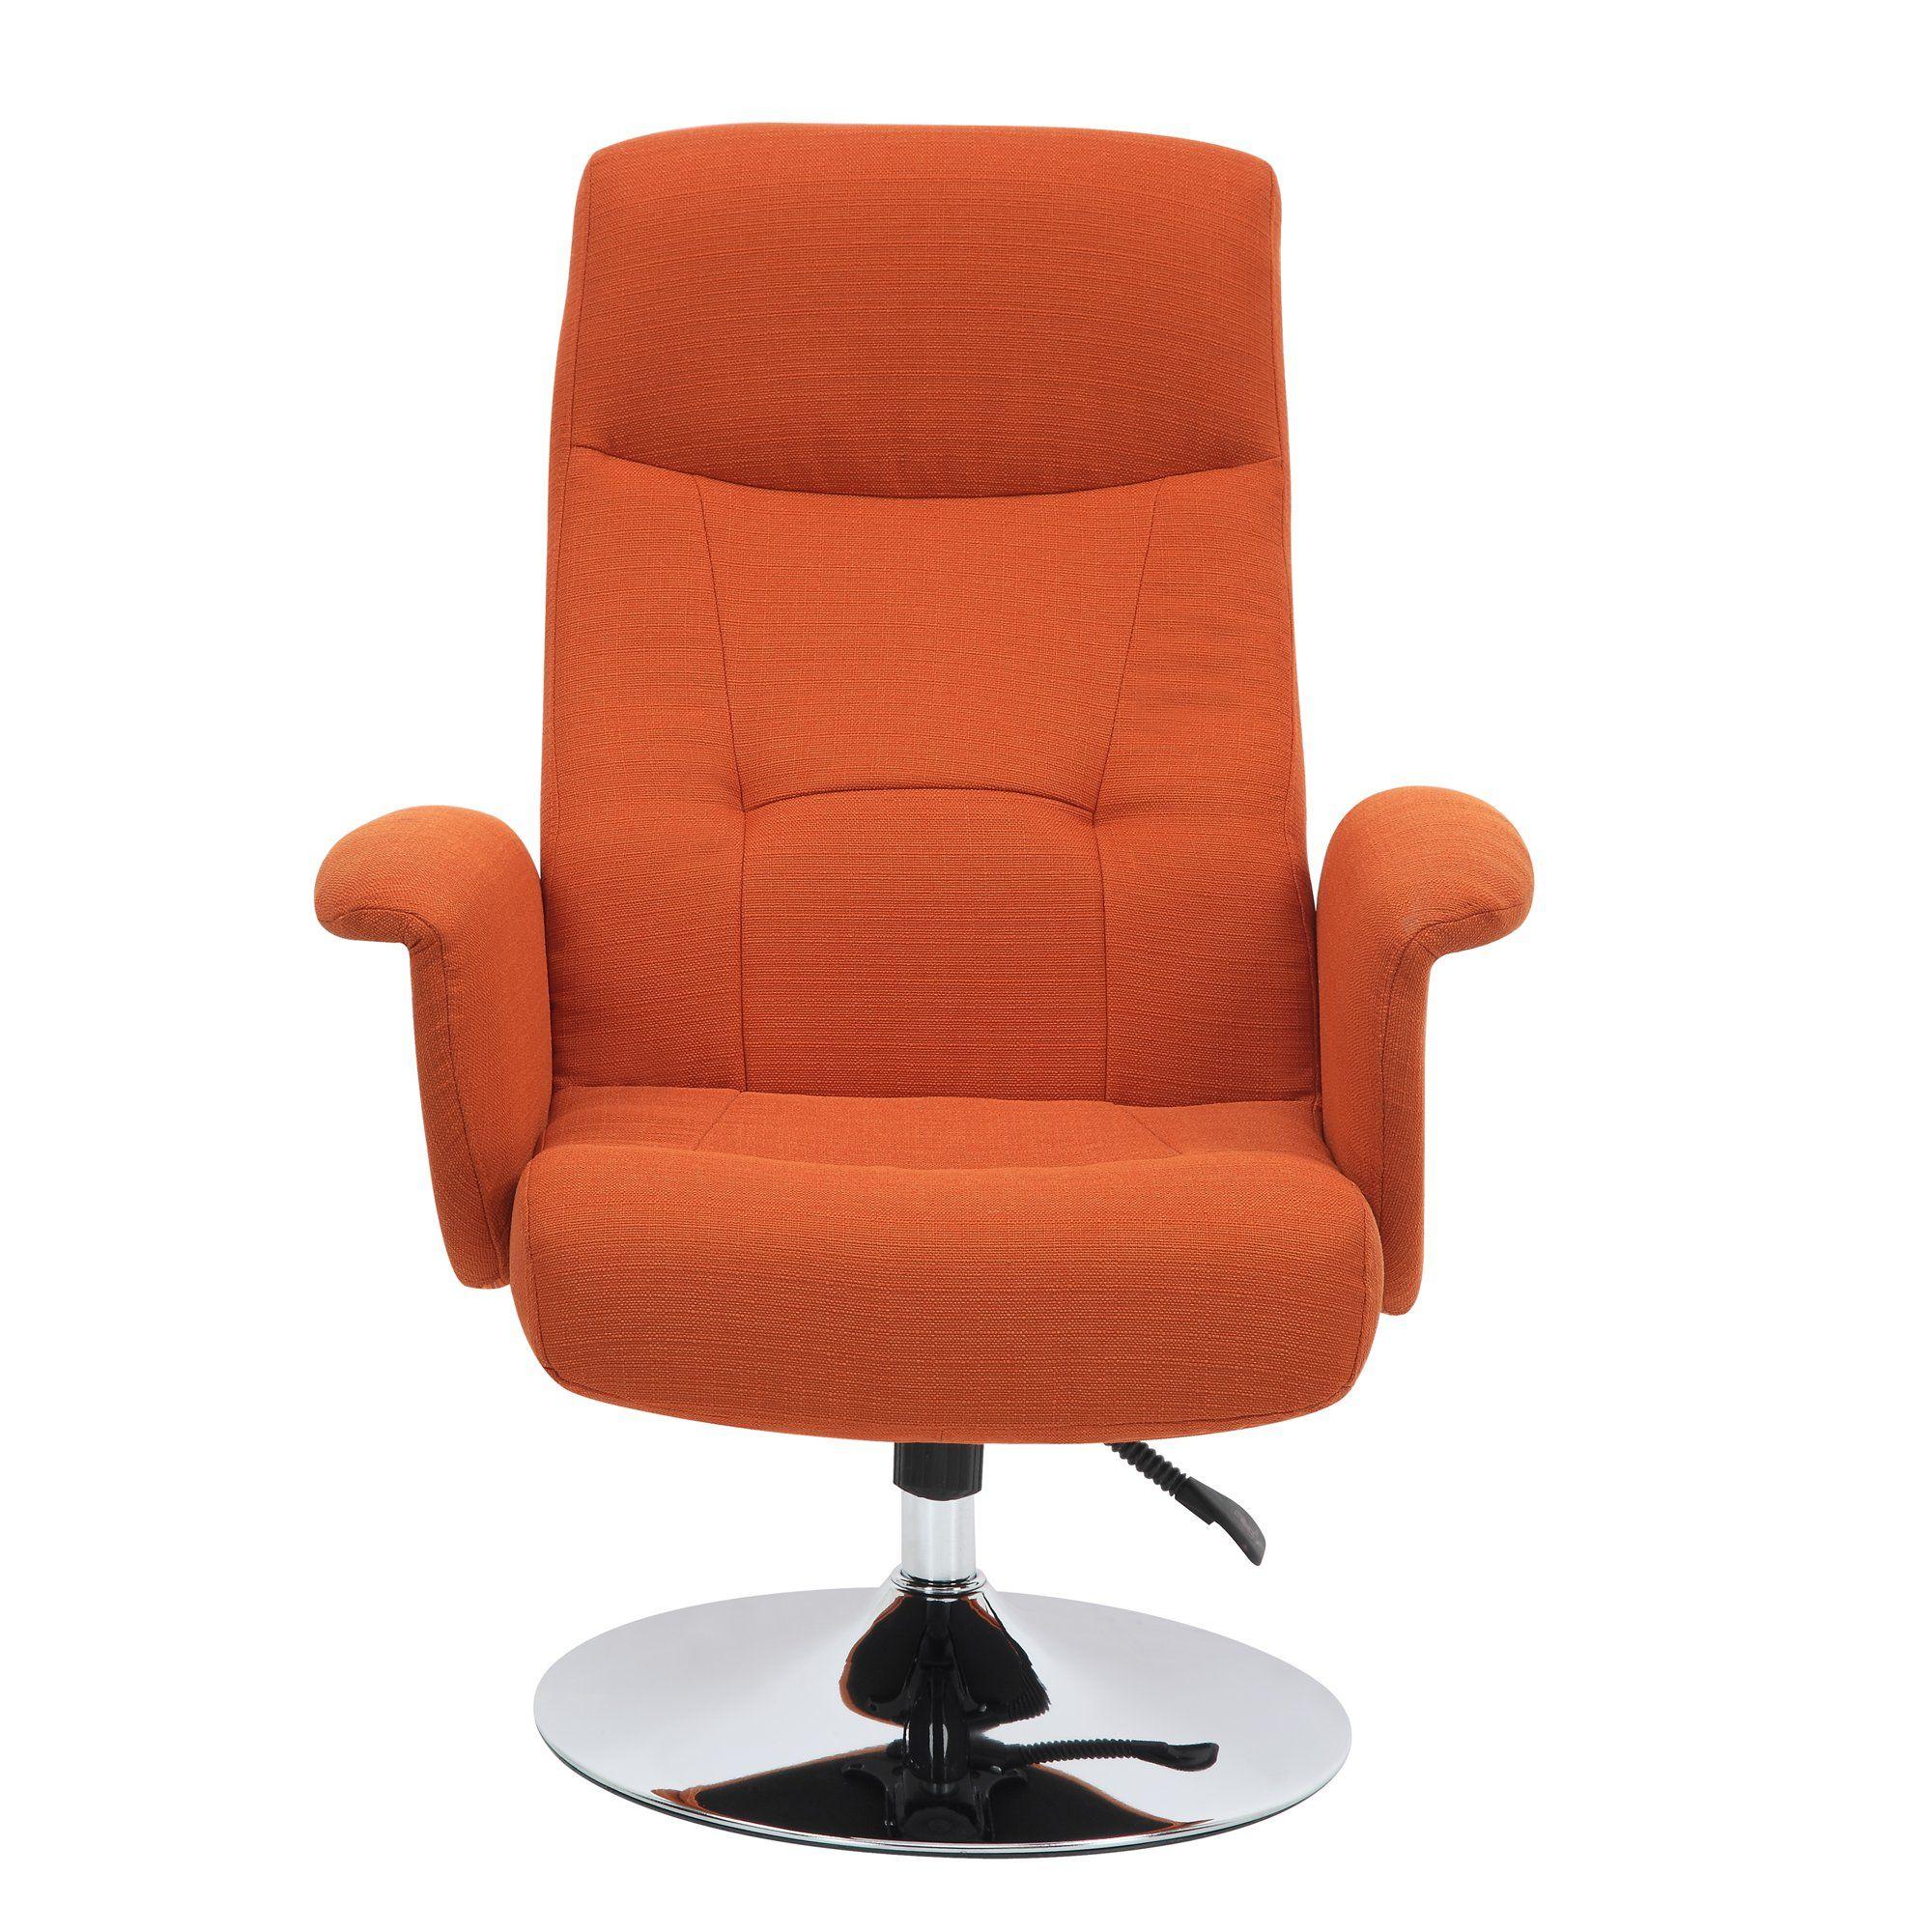 Homesvale Dublin Chair & Ottoman in Orange Linen Walmart